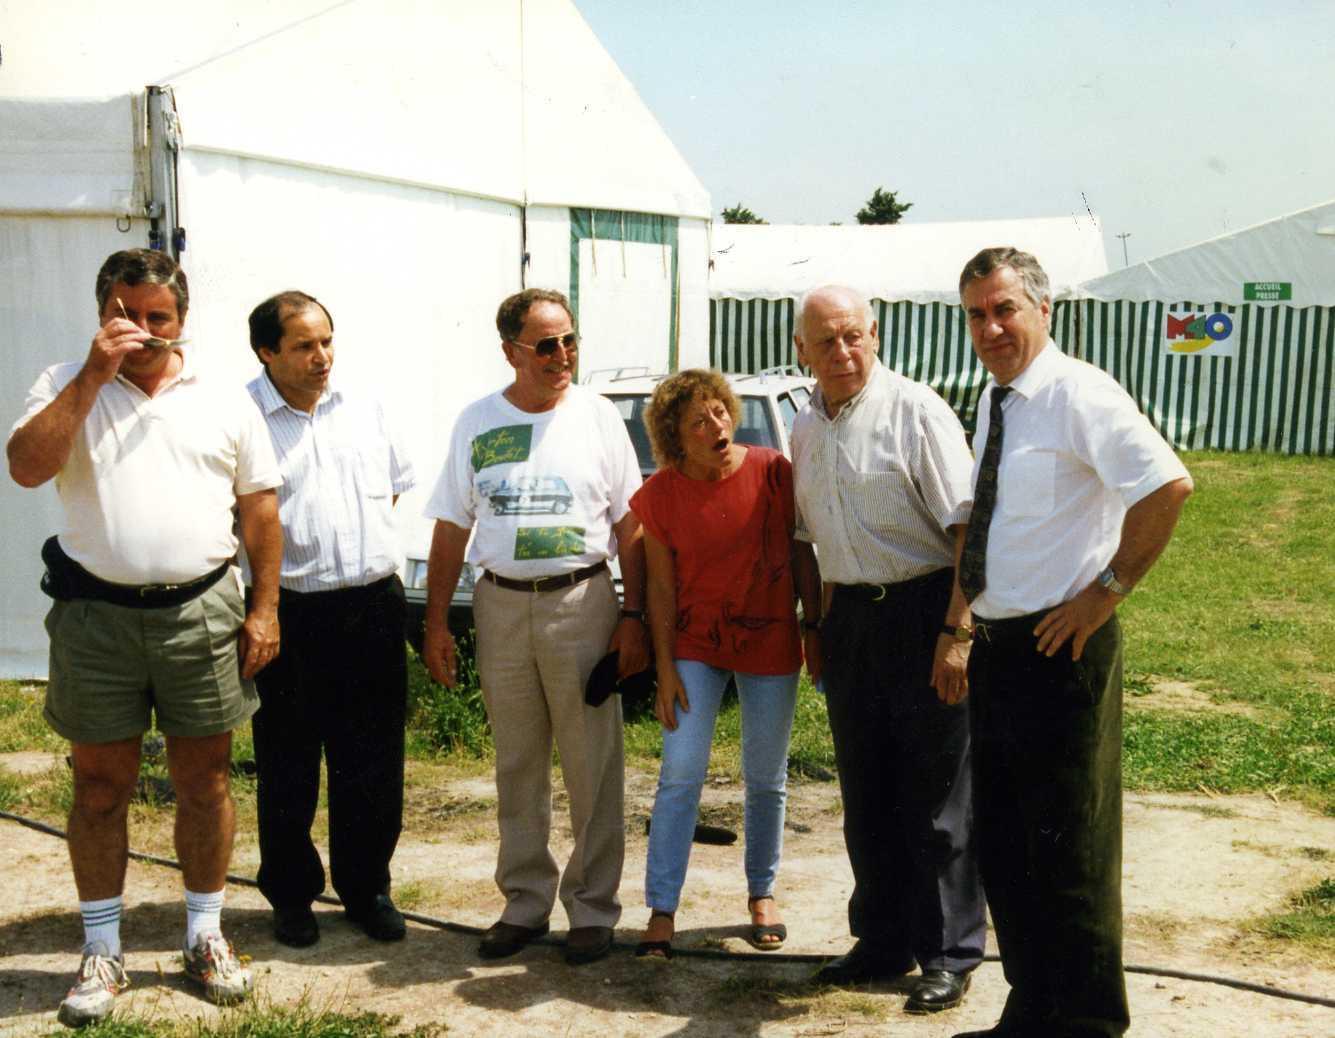 Circuit Carole Années 90